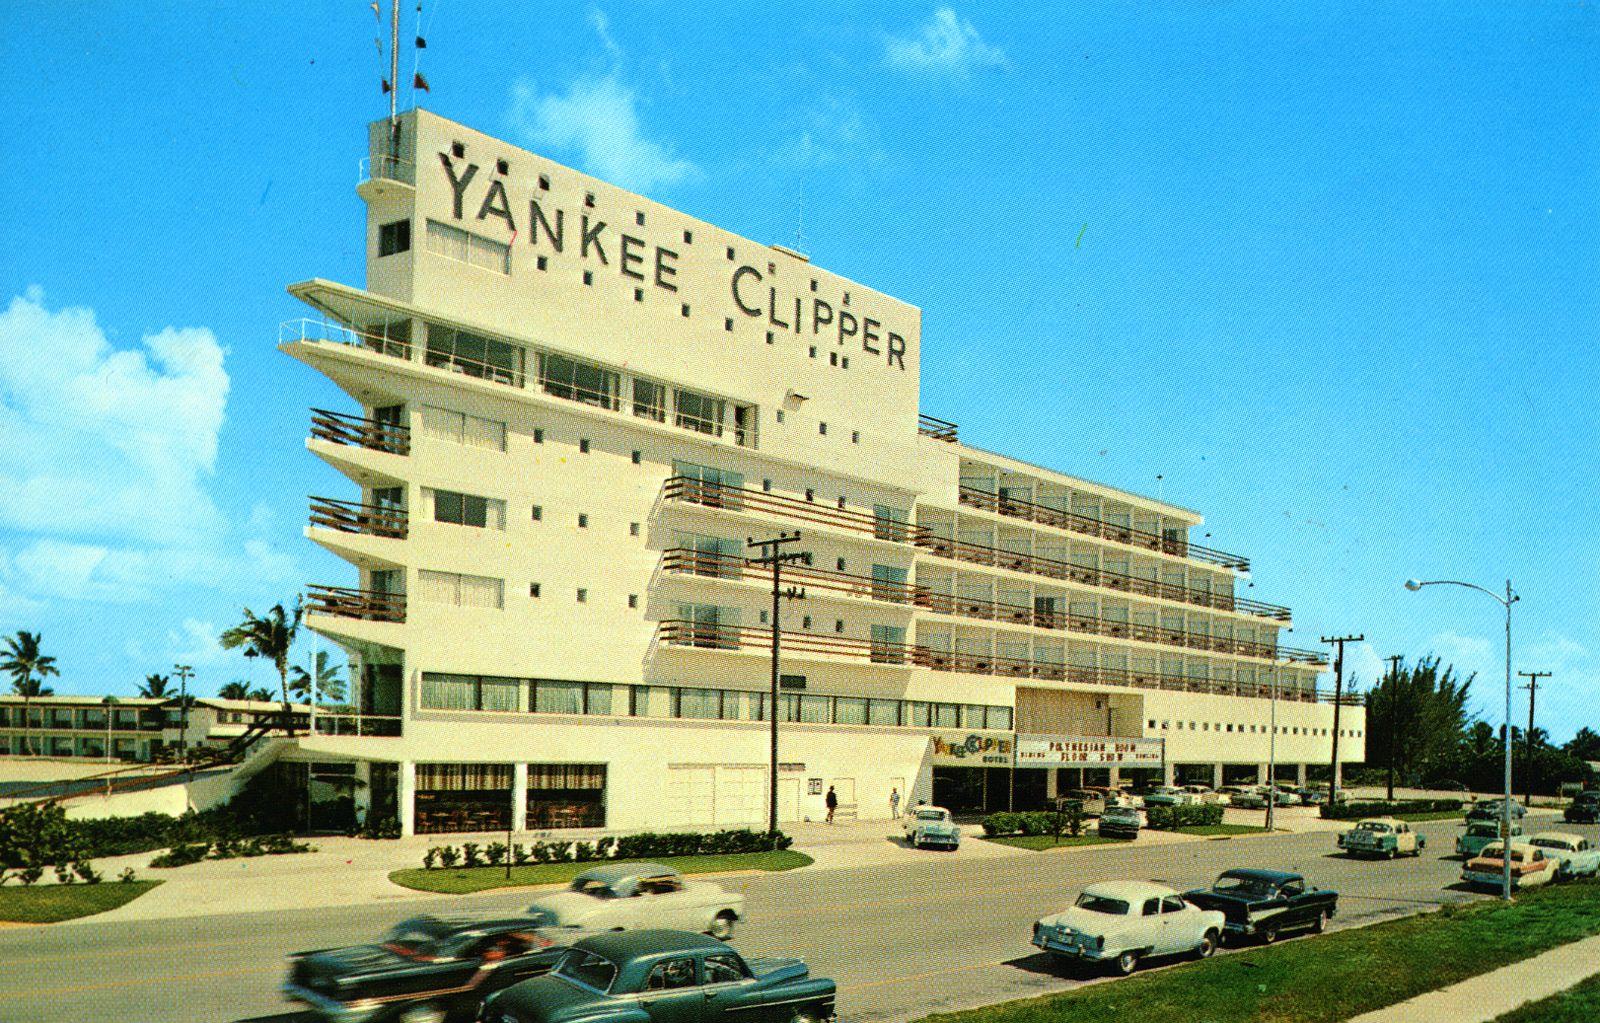 Yankee Clipper Hotel Ft Lauderdale Fort Lauderdale Hotels Florida Images Art Deco Hotel